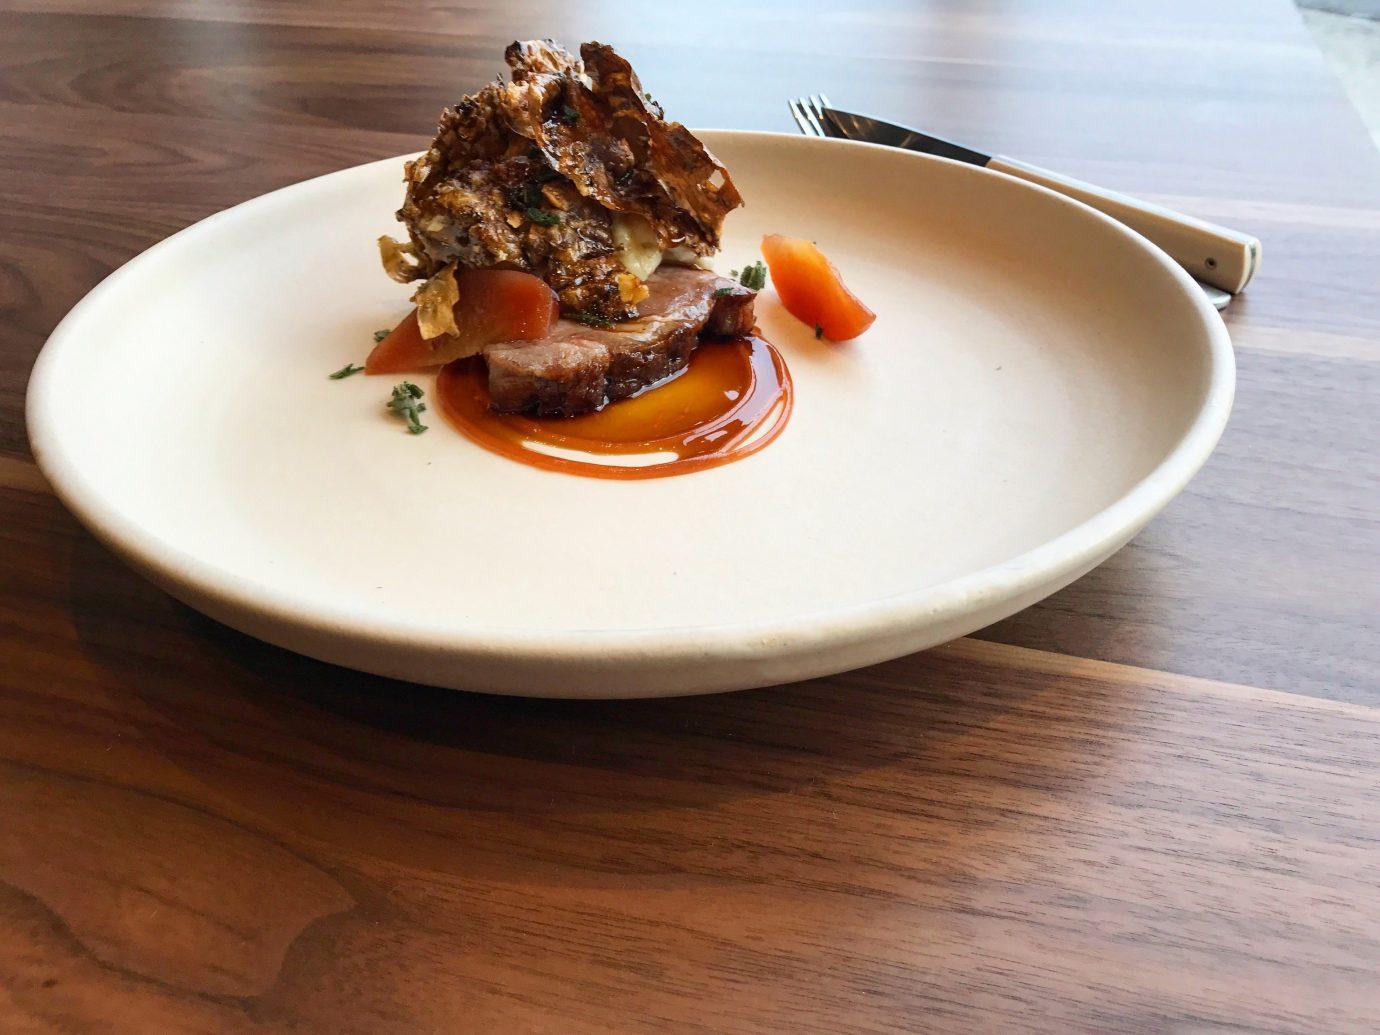 Food + Drink plate table food dish indoor meal produce breakfast meat cuisine vegetable dessert piece de resistance